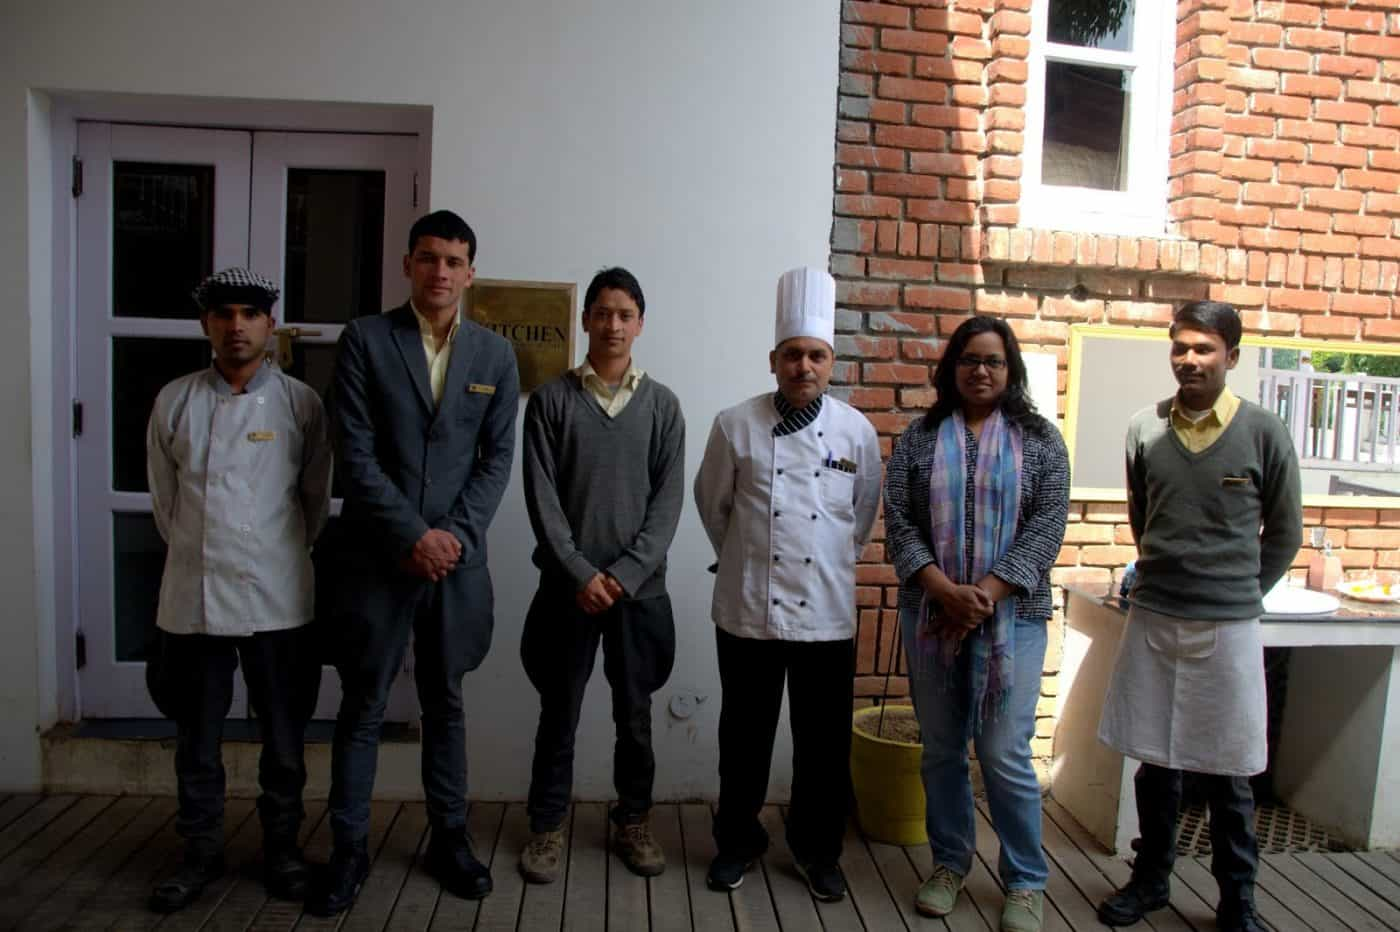 With the culinary team of TeAroha where she helped put together an organic menu amidst the Himalayas